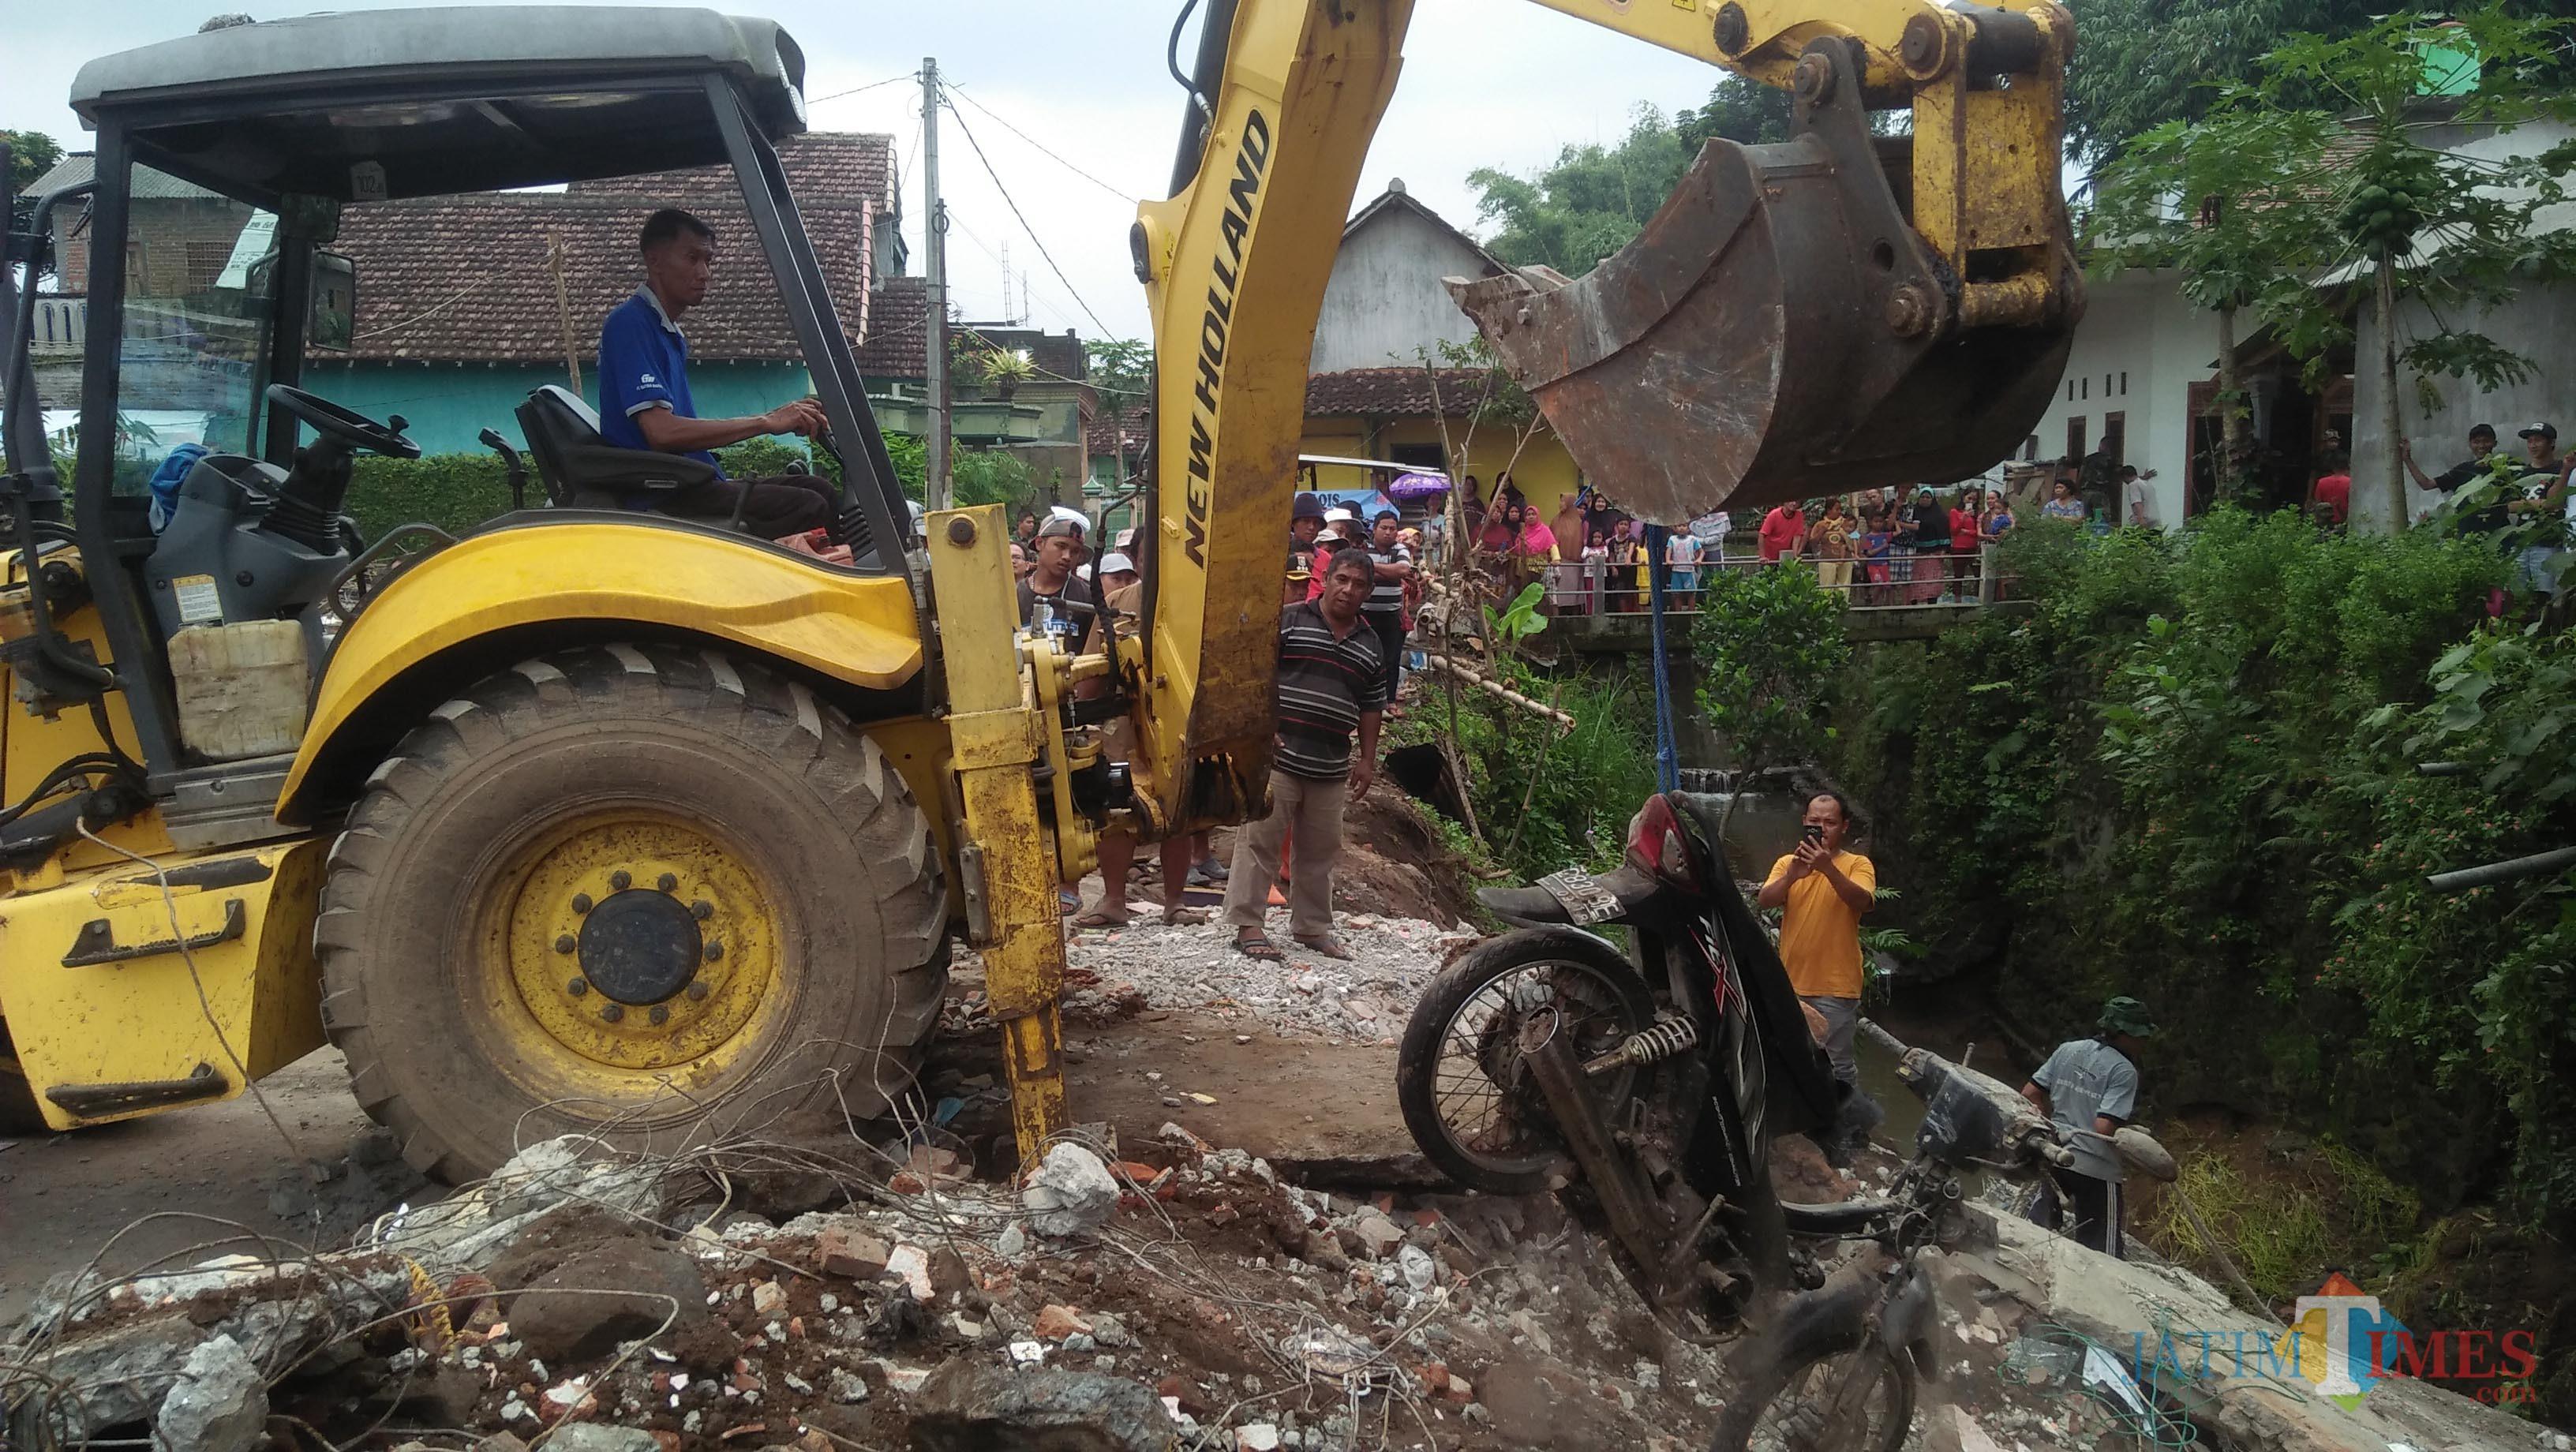 Pengangkatan motor terakhir penghuni rumah kos yang ambruk di Desa Losari Kecamatan Singosari dengan menggunakan alat berat milik TPU. (Luqmanul Hakim/Malang Times)